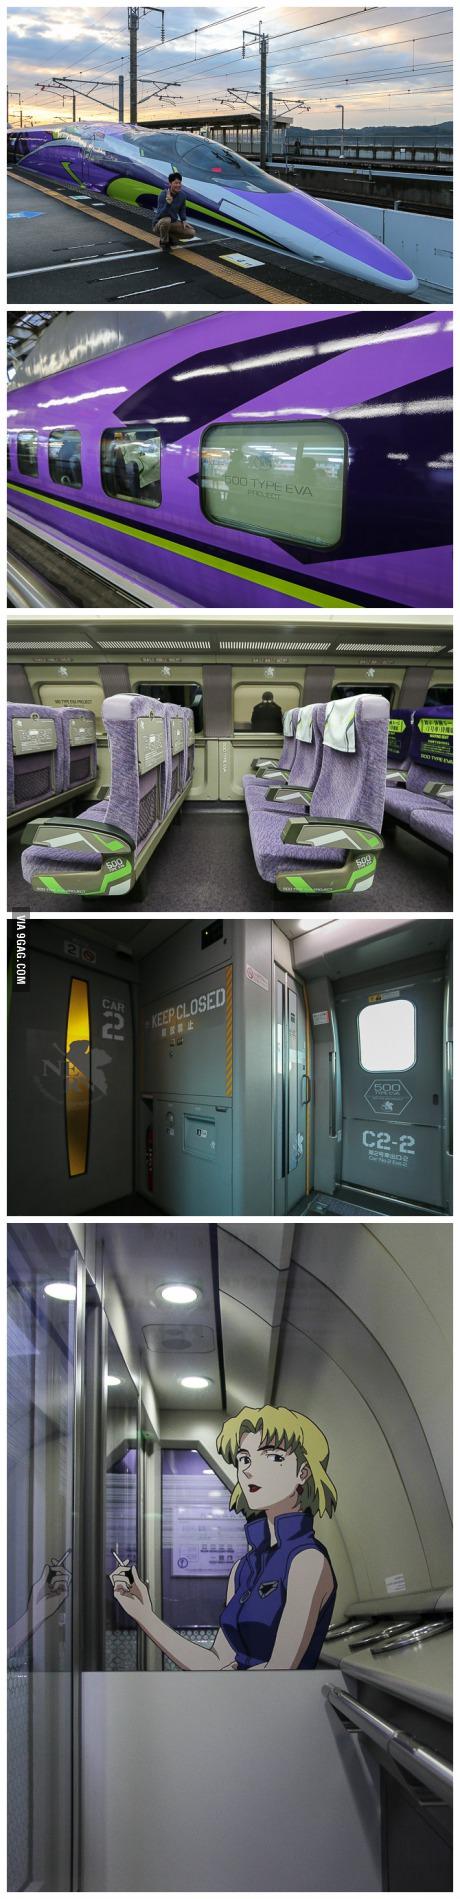 Evangelion Themed Shinkansen in Japan (Sanyo Shinkansen Line)